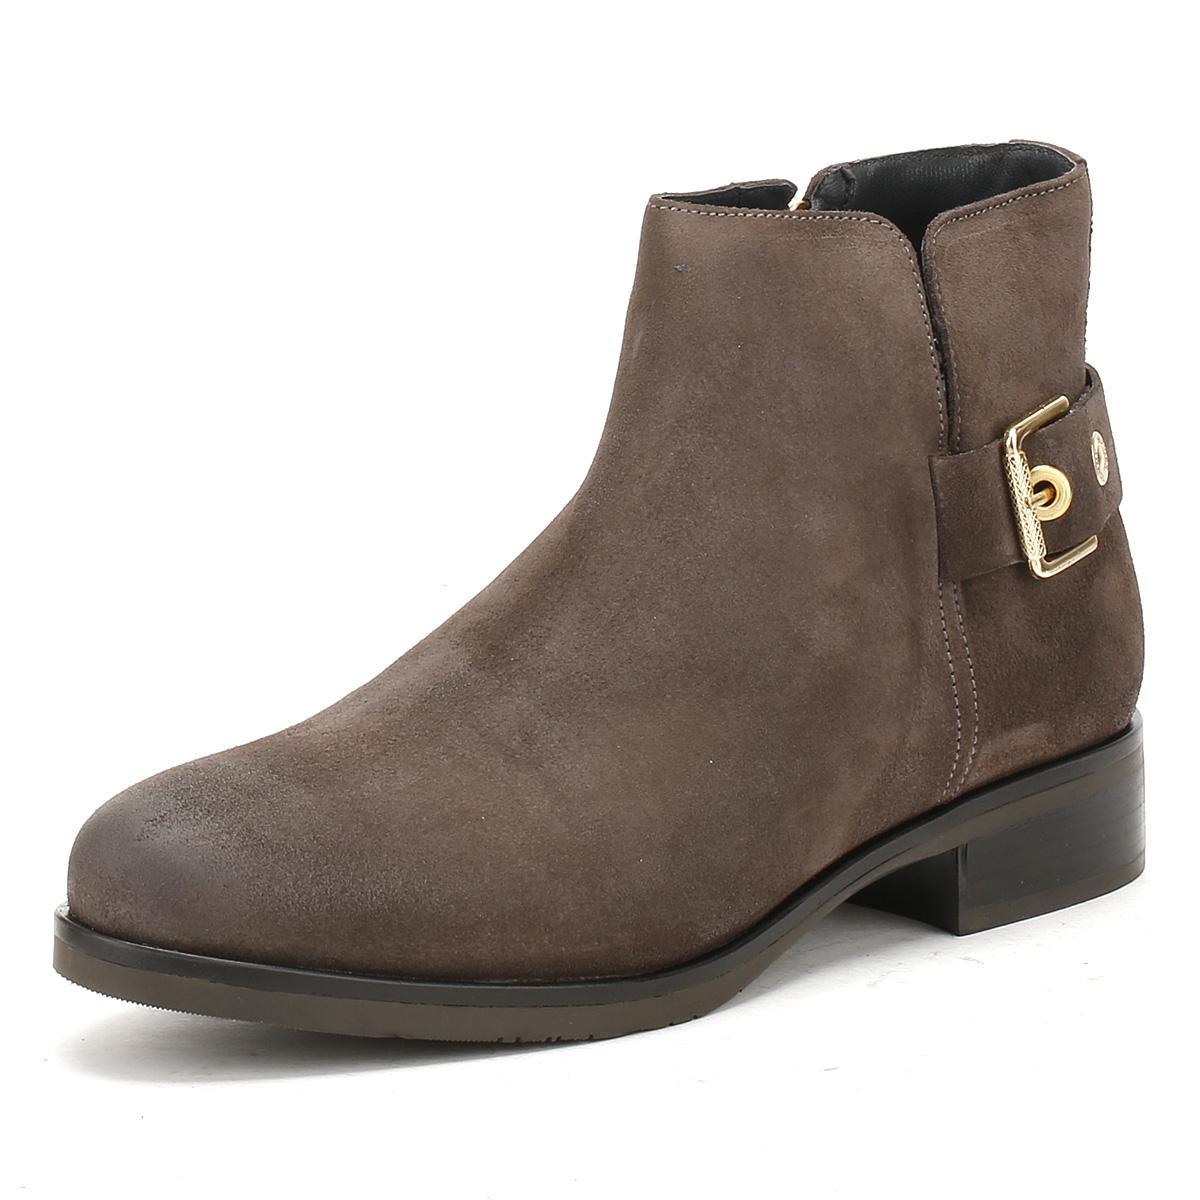 5950daa8 Tommy Hilfiger Womens Black Coffee Tessa 1b Ankle Boots Women's Low ...